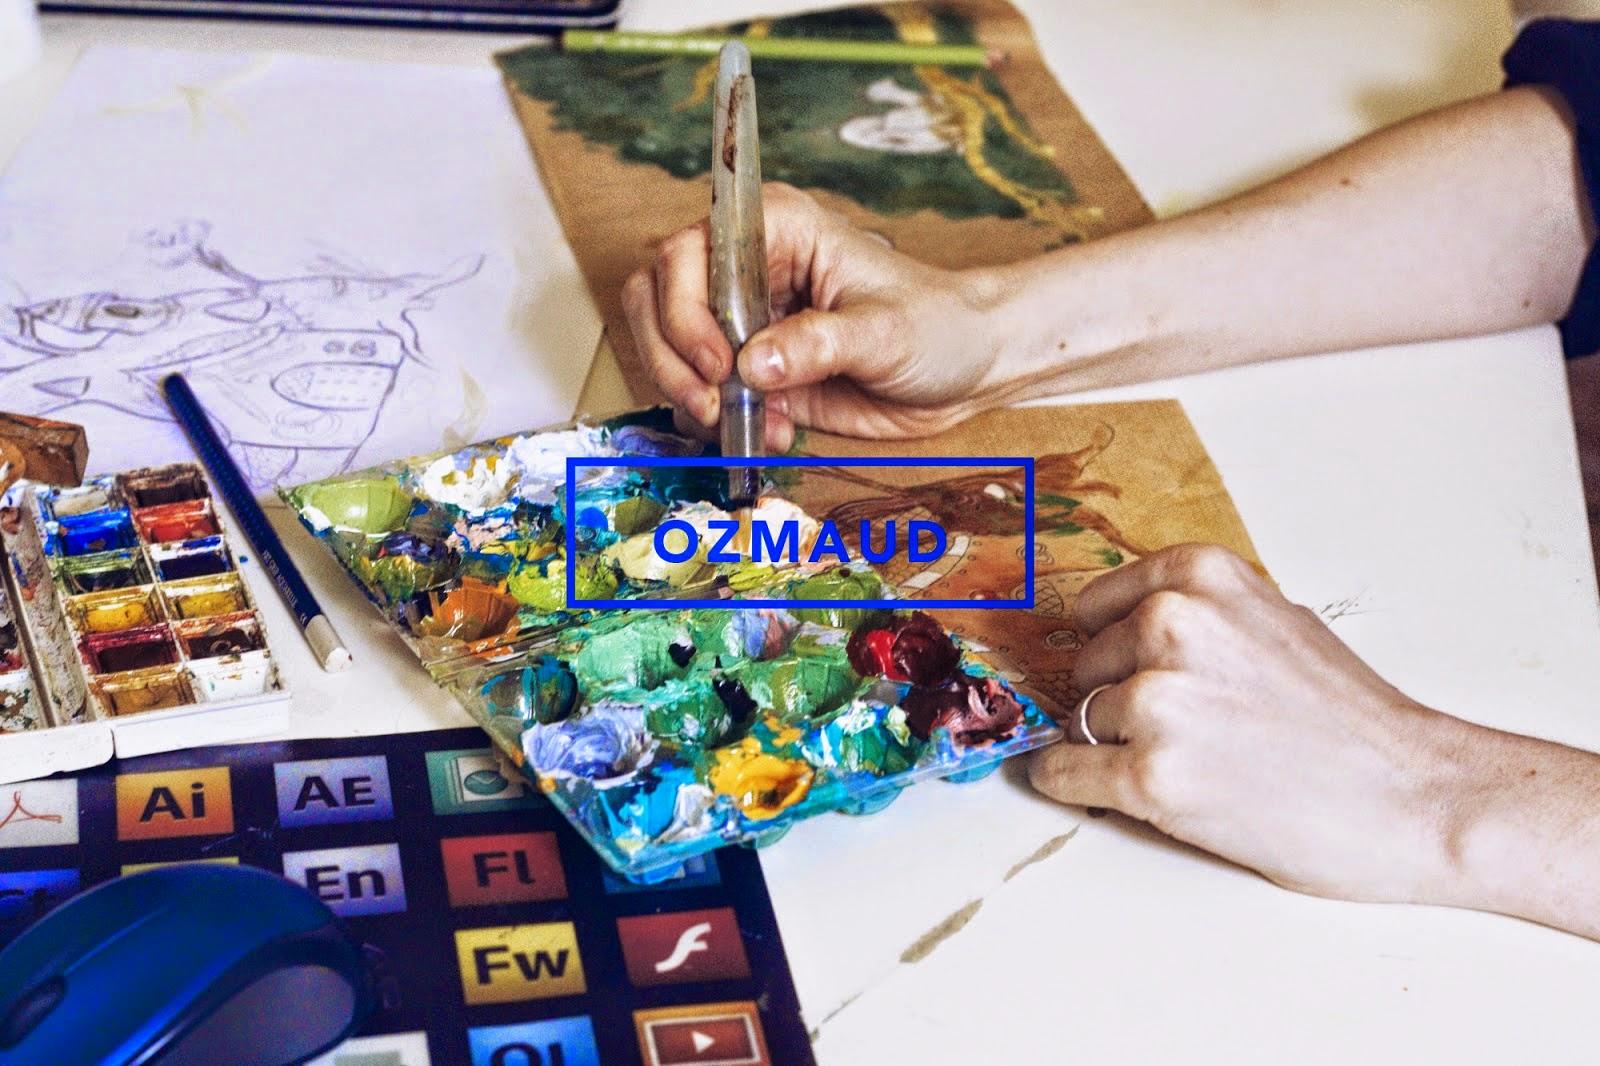 http://teamnantes.blogspot.fr/2014/05/ozmaud-peintre-et-illustratrice.html